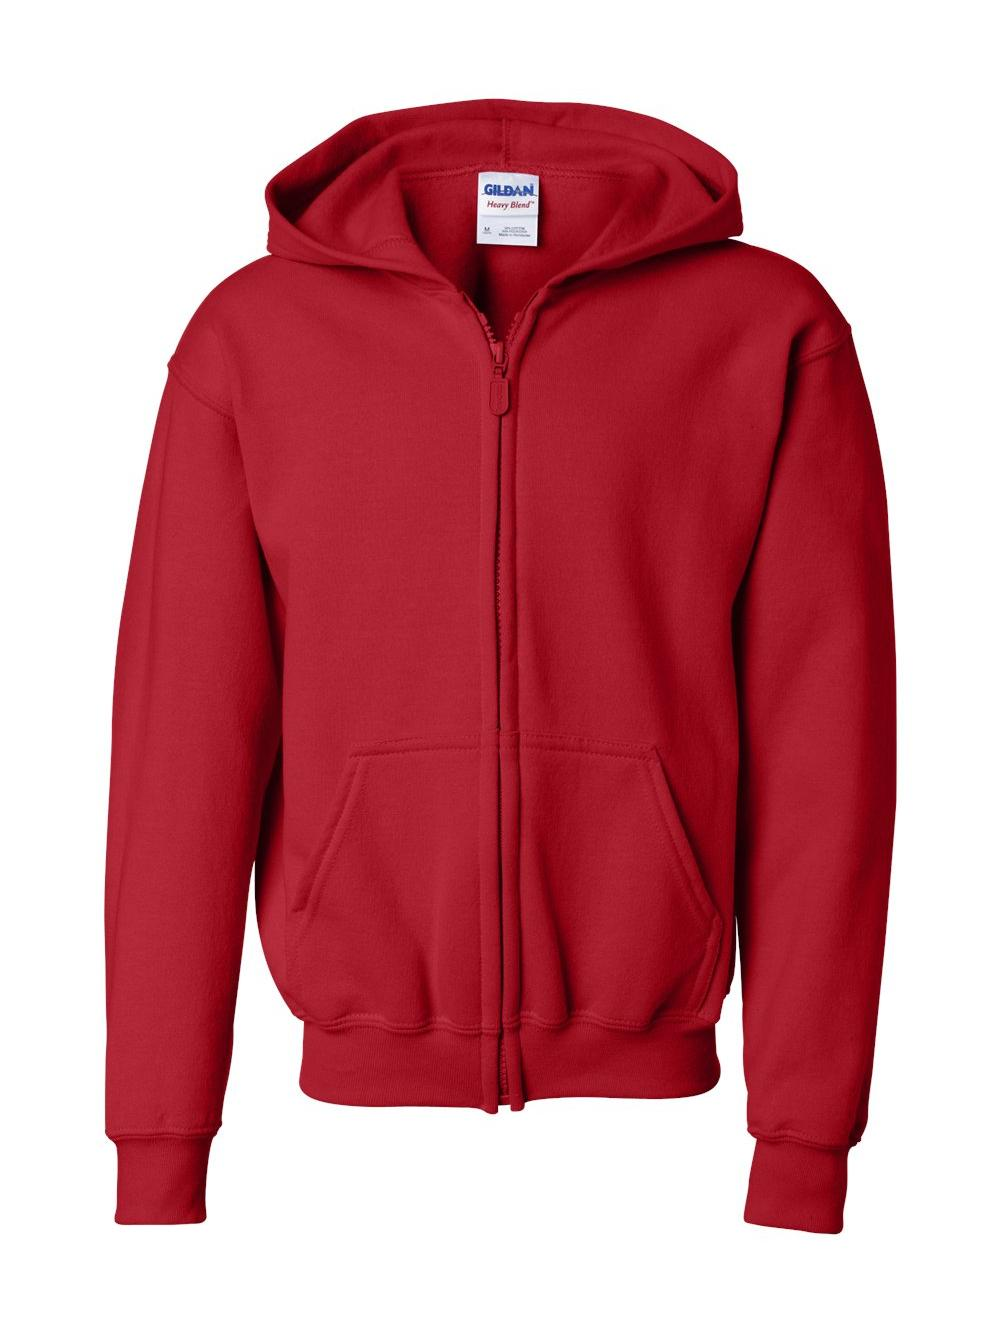 Fleece Heavy Blend Youth Full-Zip Hooded Sweatshirt